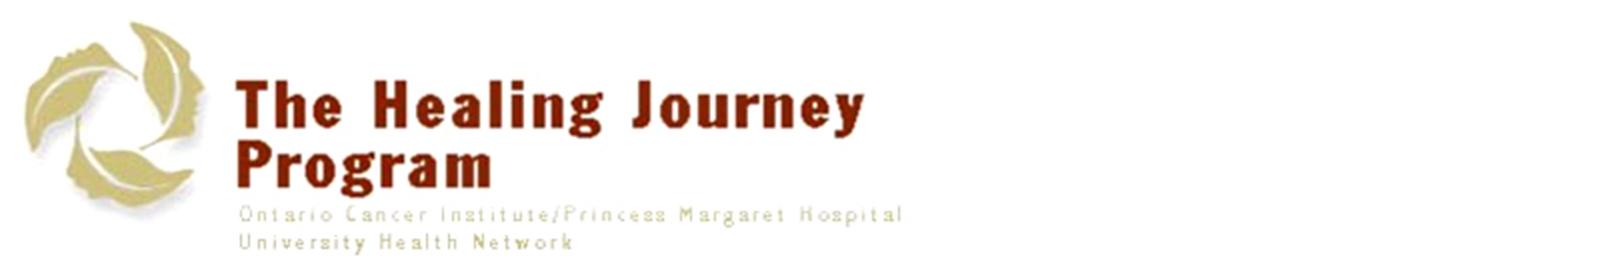 TCC_the_healing_journey